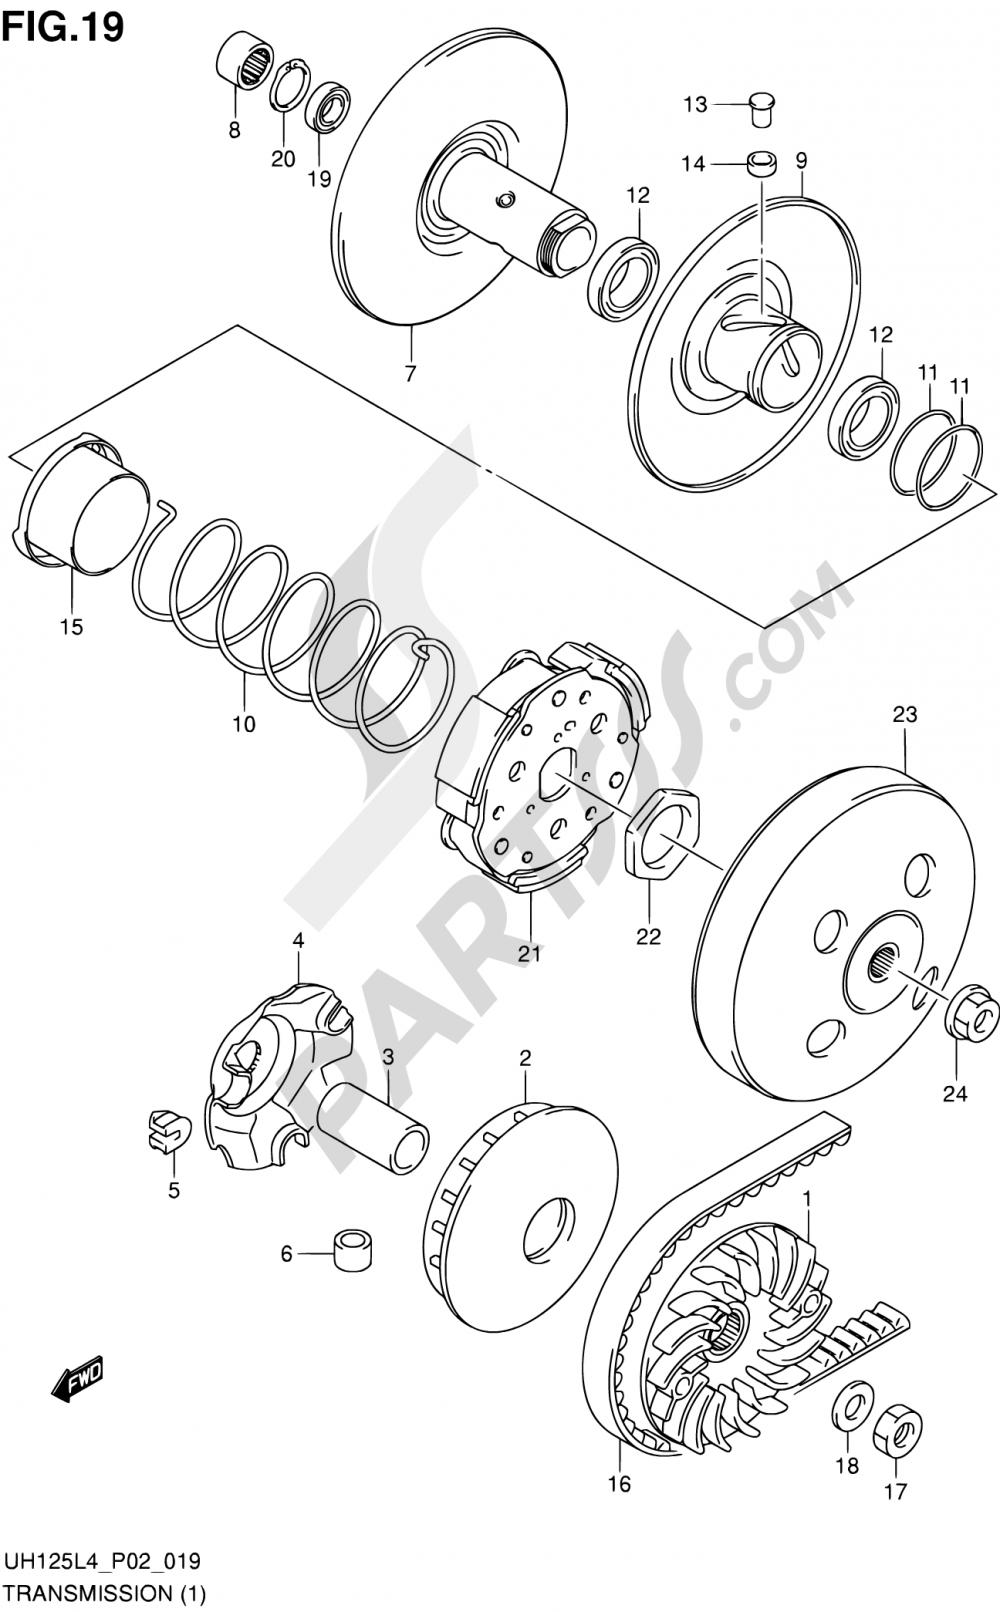 19 - TRANSMISSION (1) Suzuki BURGMAN UH125 2014